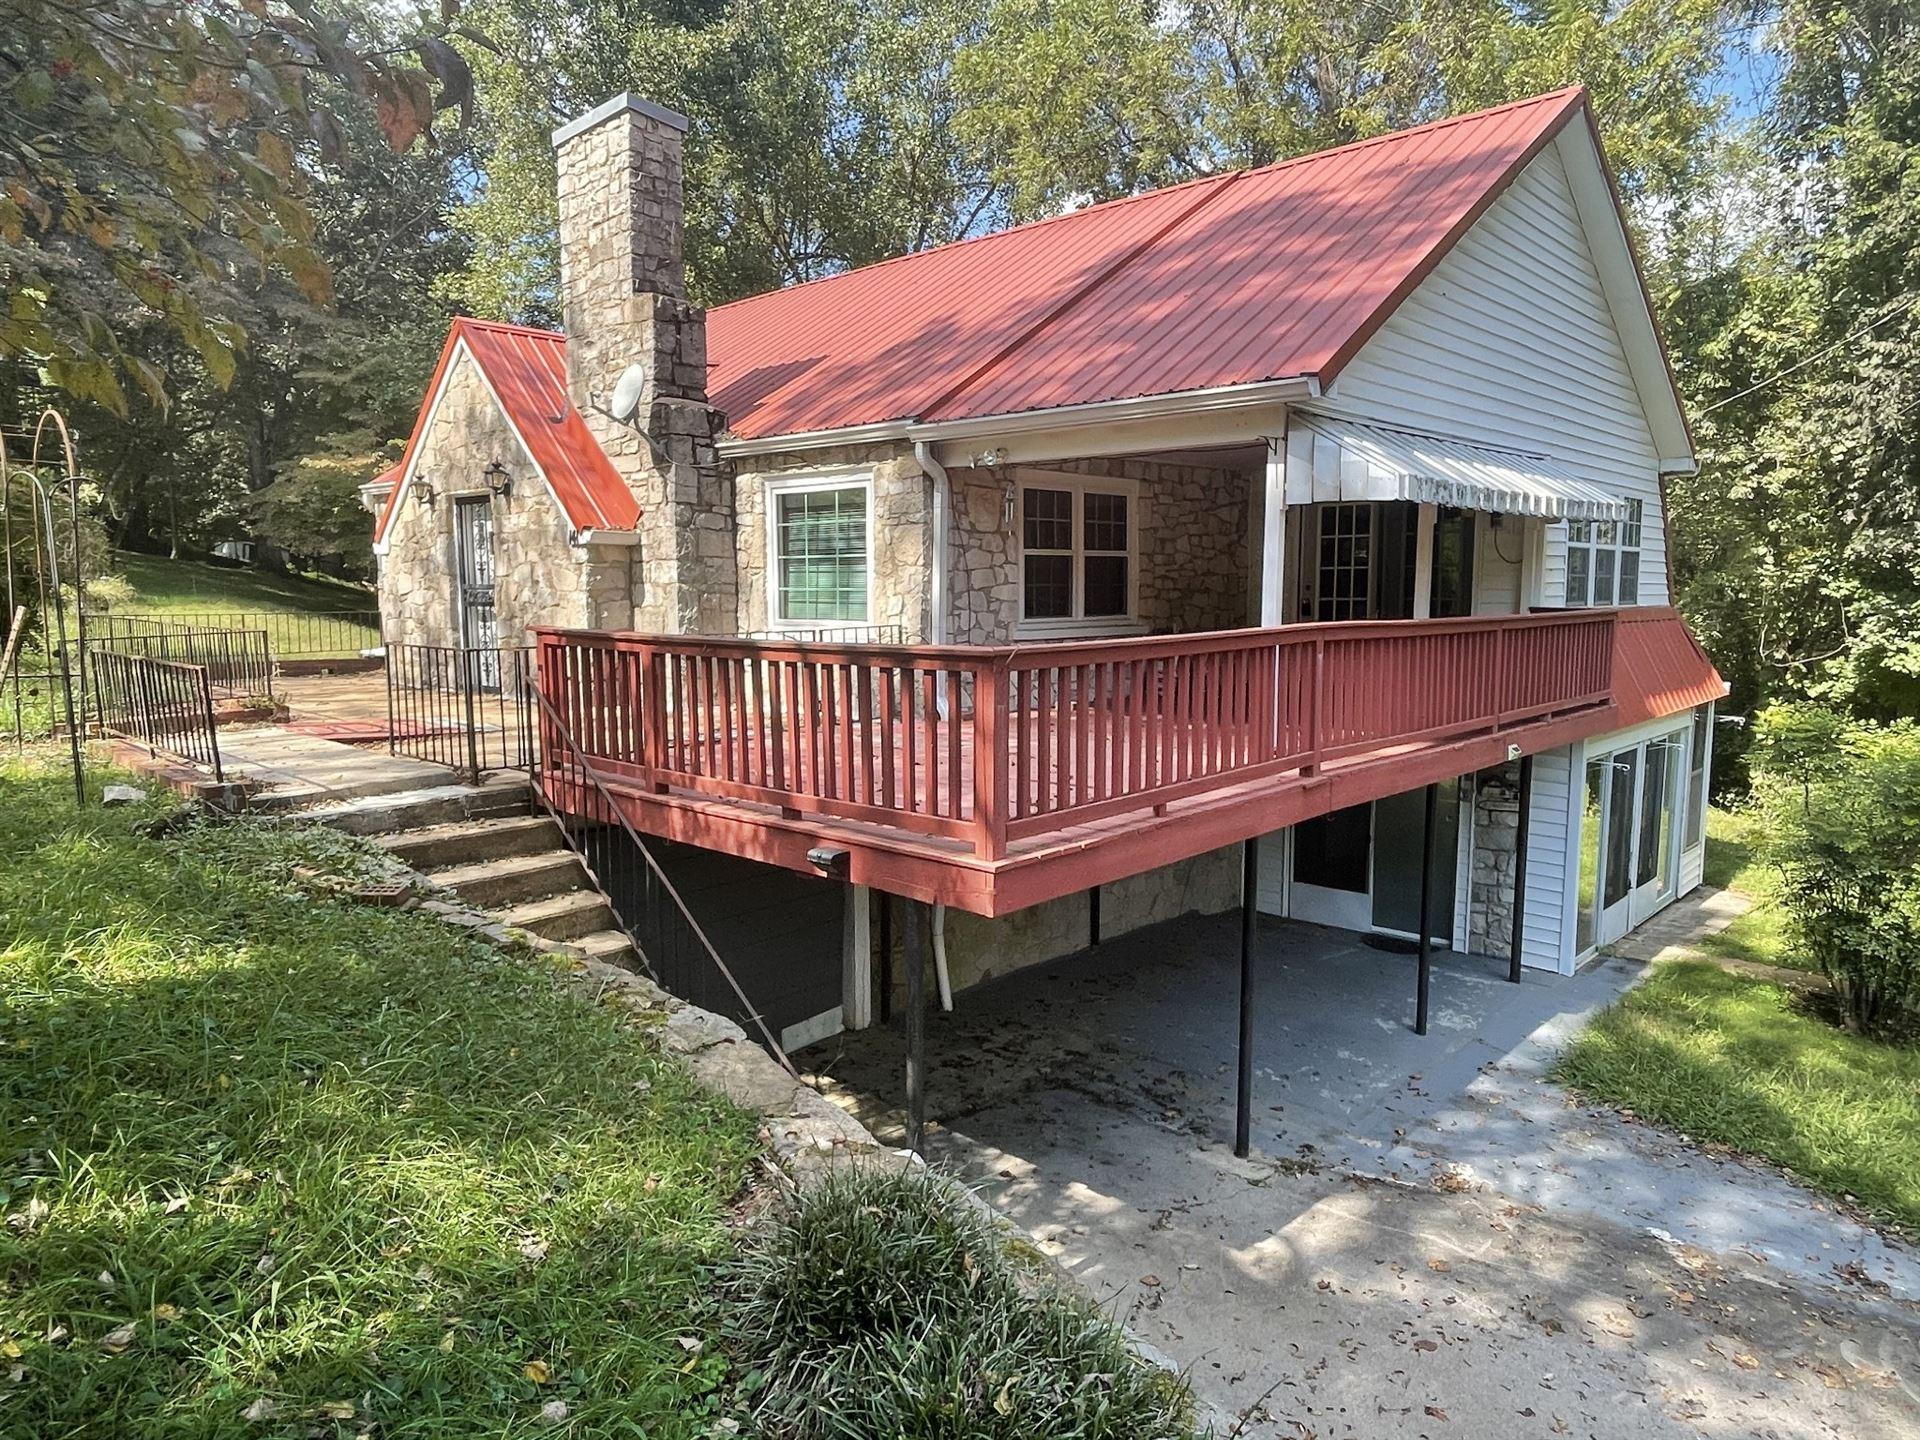 141 Hickory Grove Blvd, Clarksville, TN 37040 - MLS#: 2296084